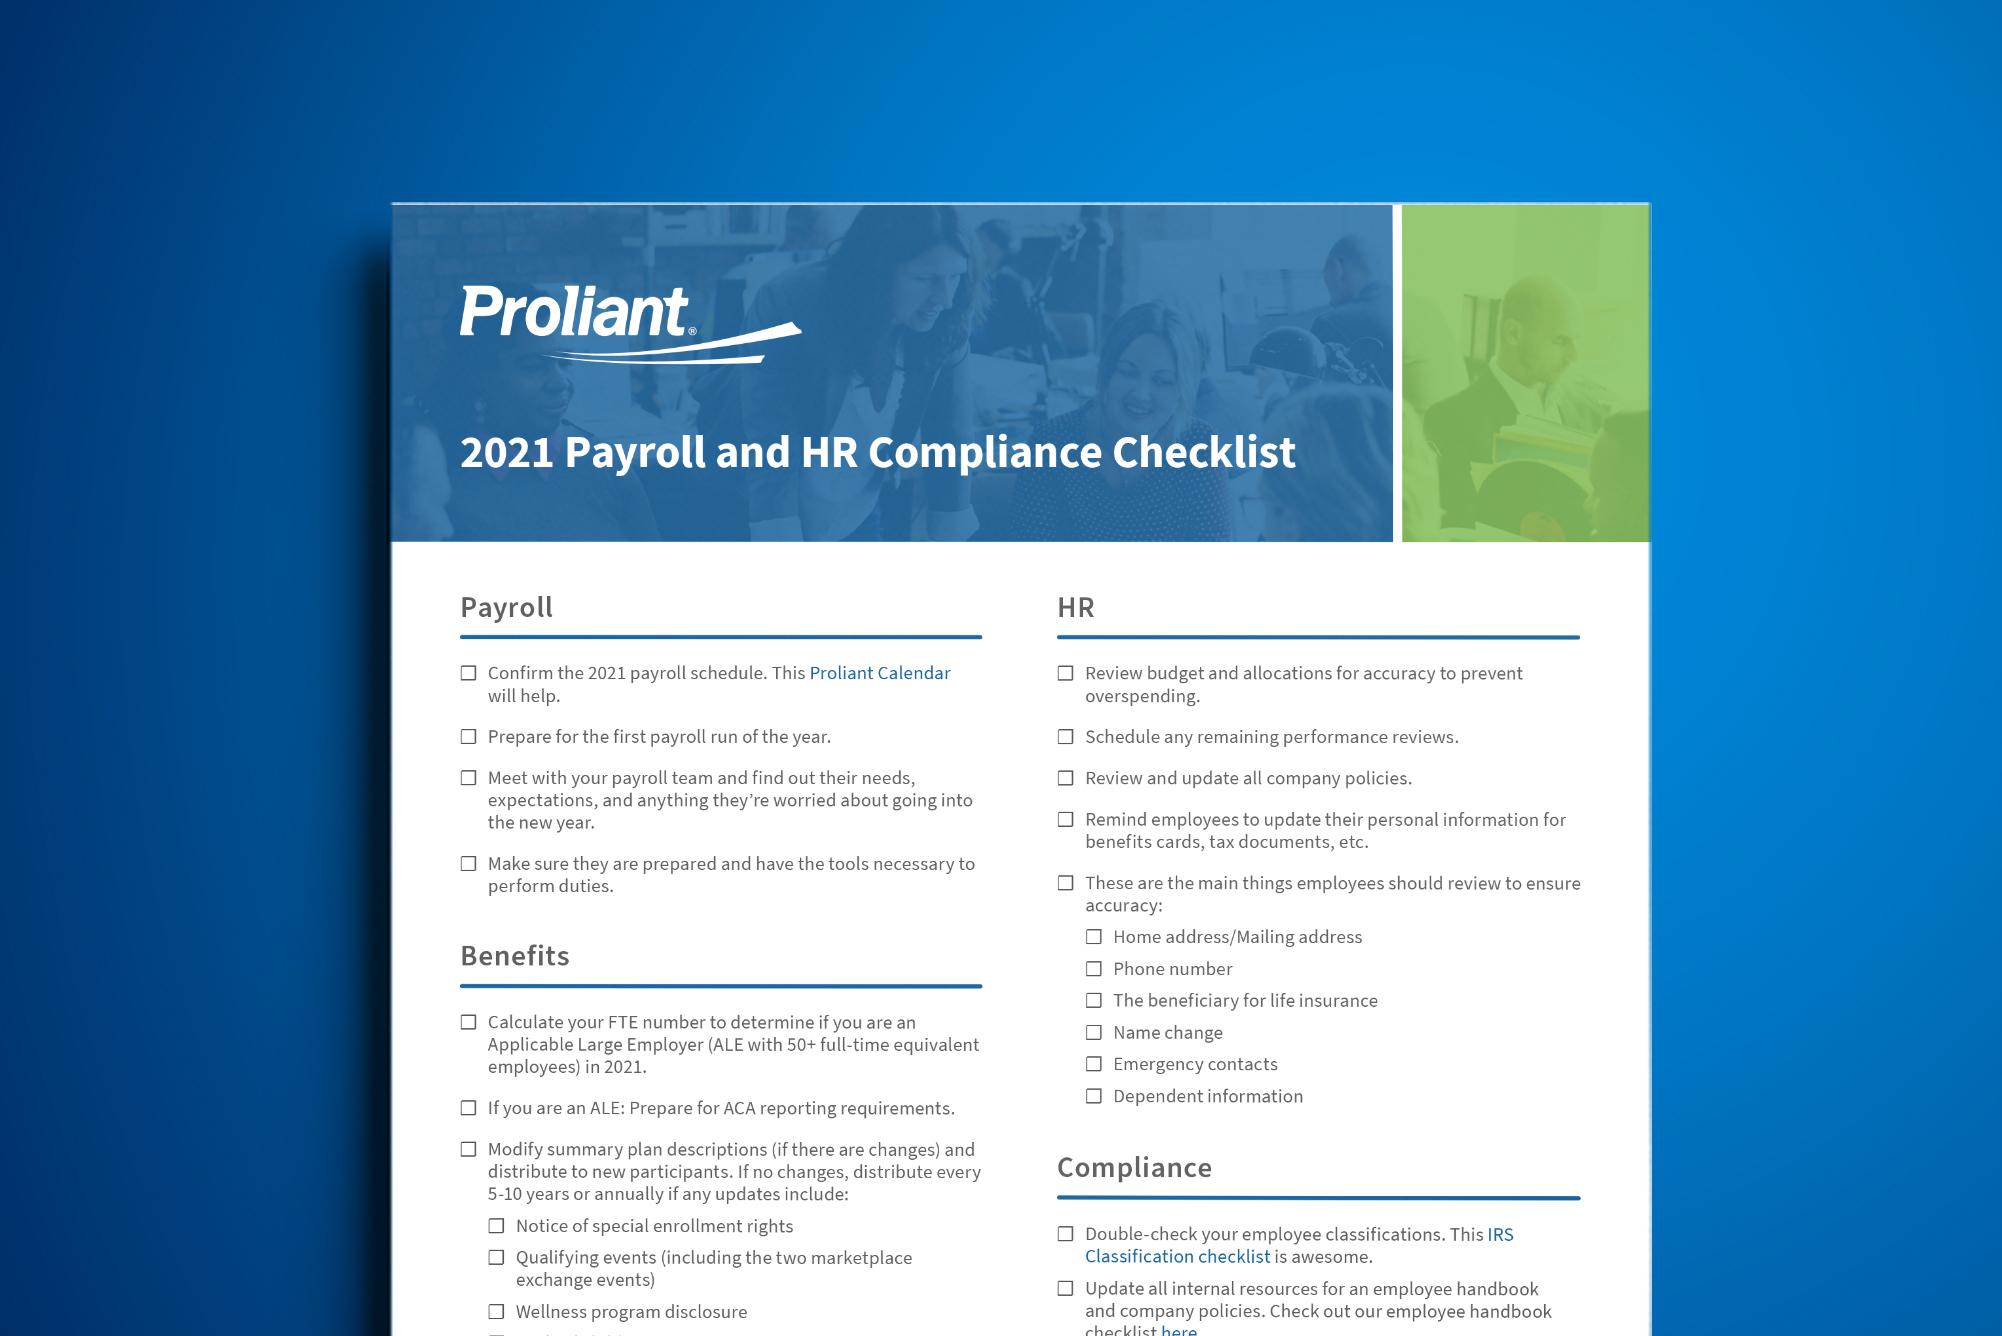 payroll-hr-compliance-checklist-2021-mockup